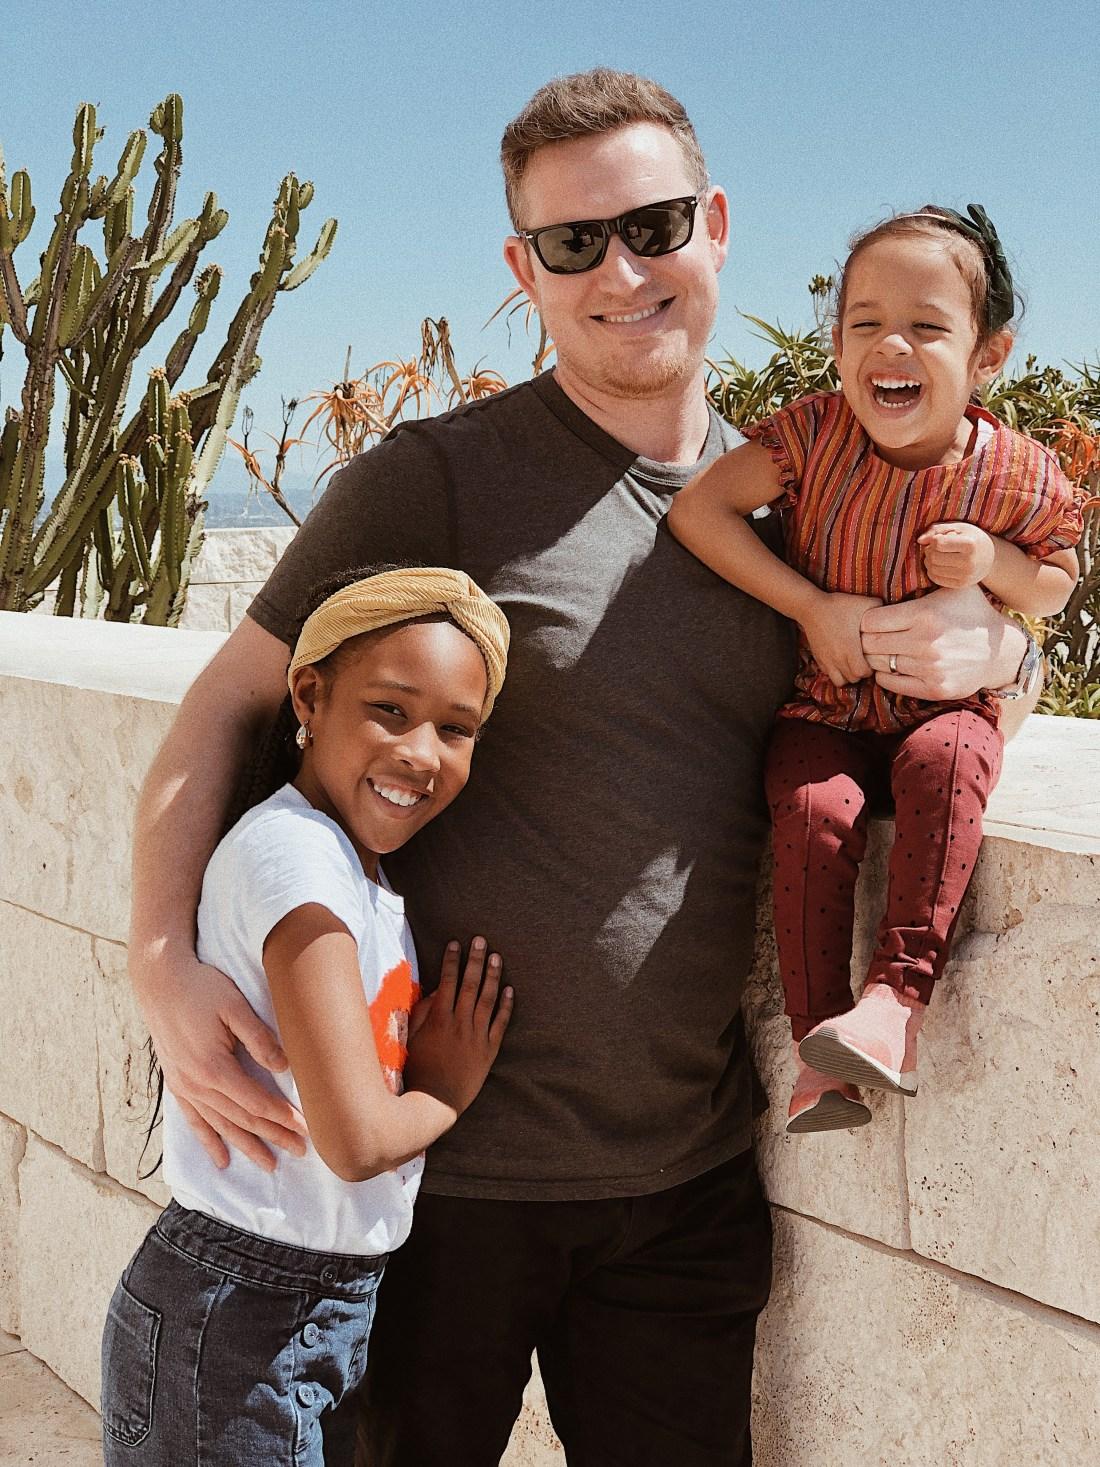 The Hautemommie: A Long Beach based lifestyle blog